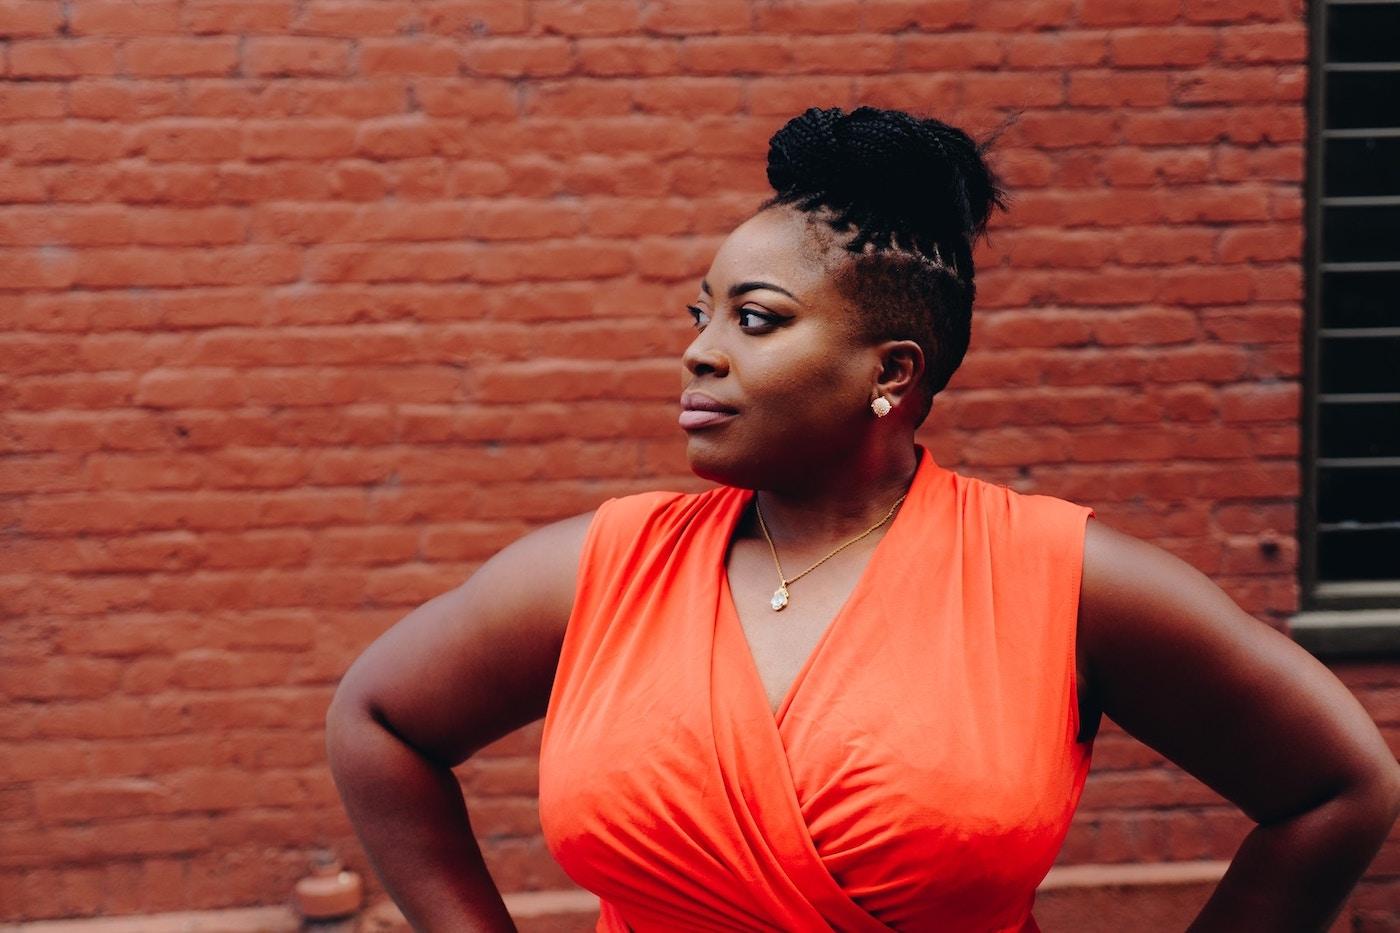 woman-orange-dress-brick-wall-15-bible-verses-for-hard-times